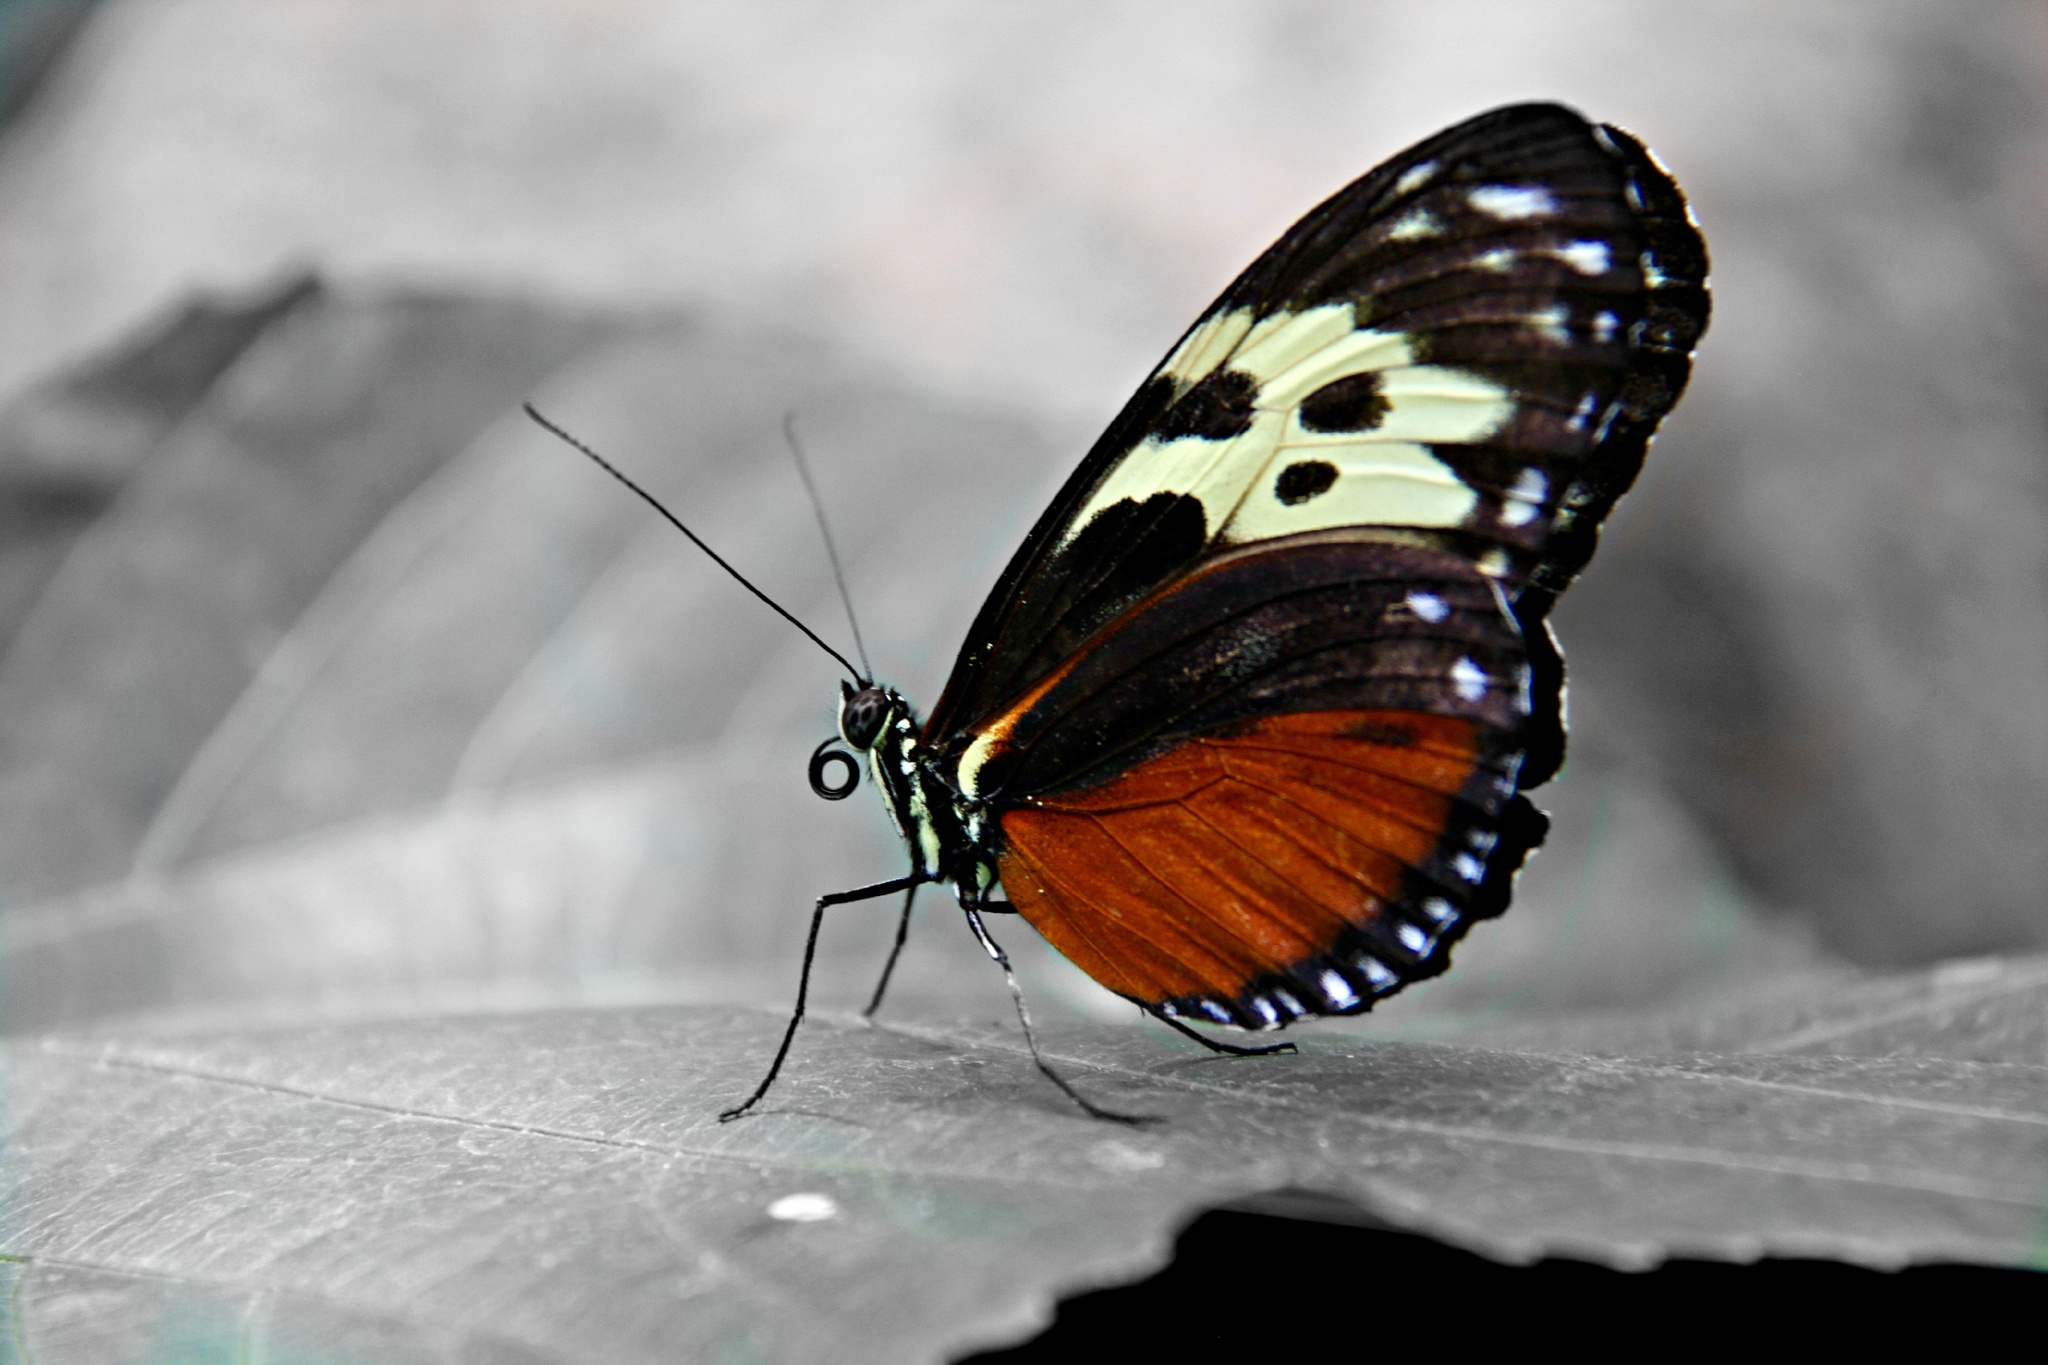 Colour Splash Butterfly (2) by Steven Bonk